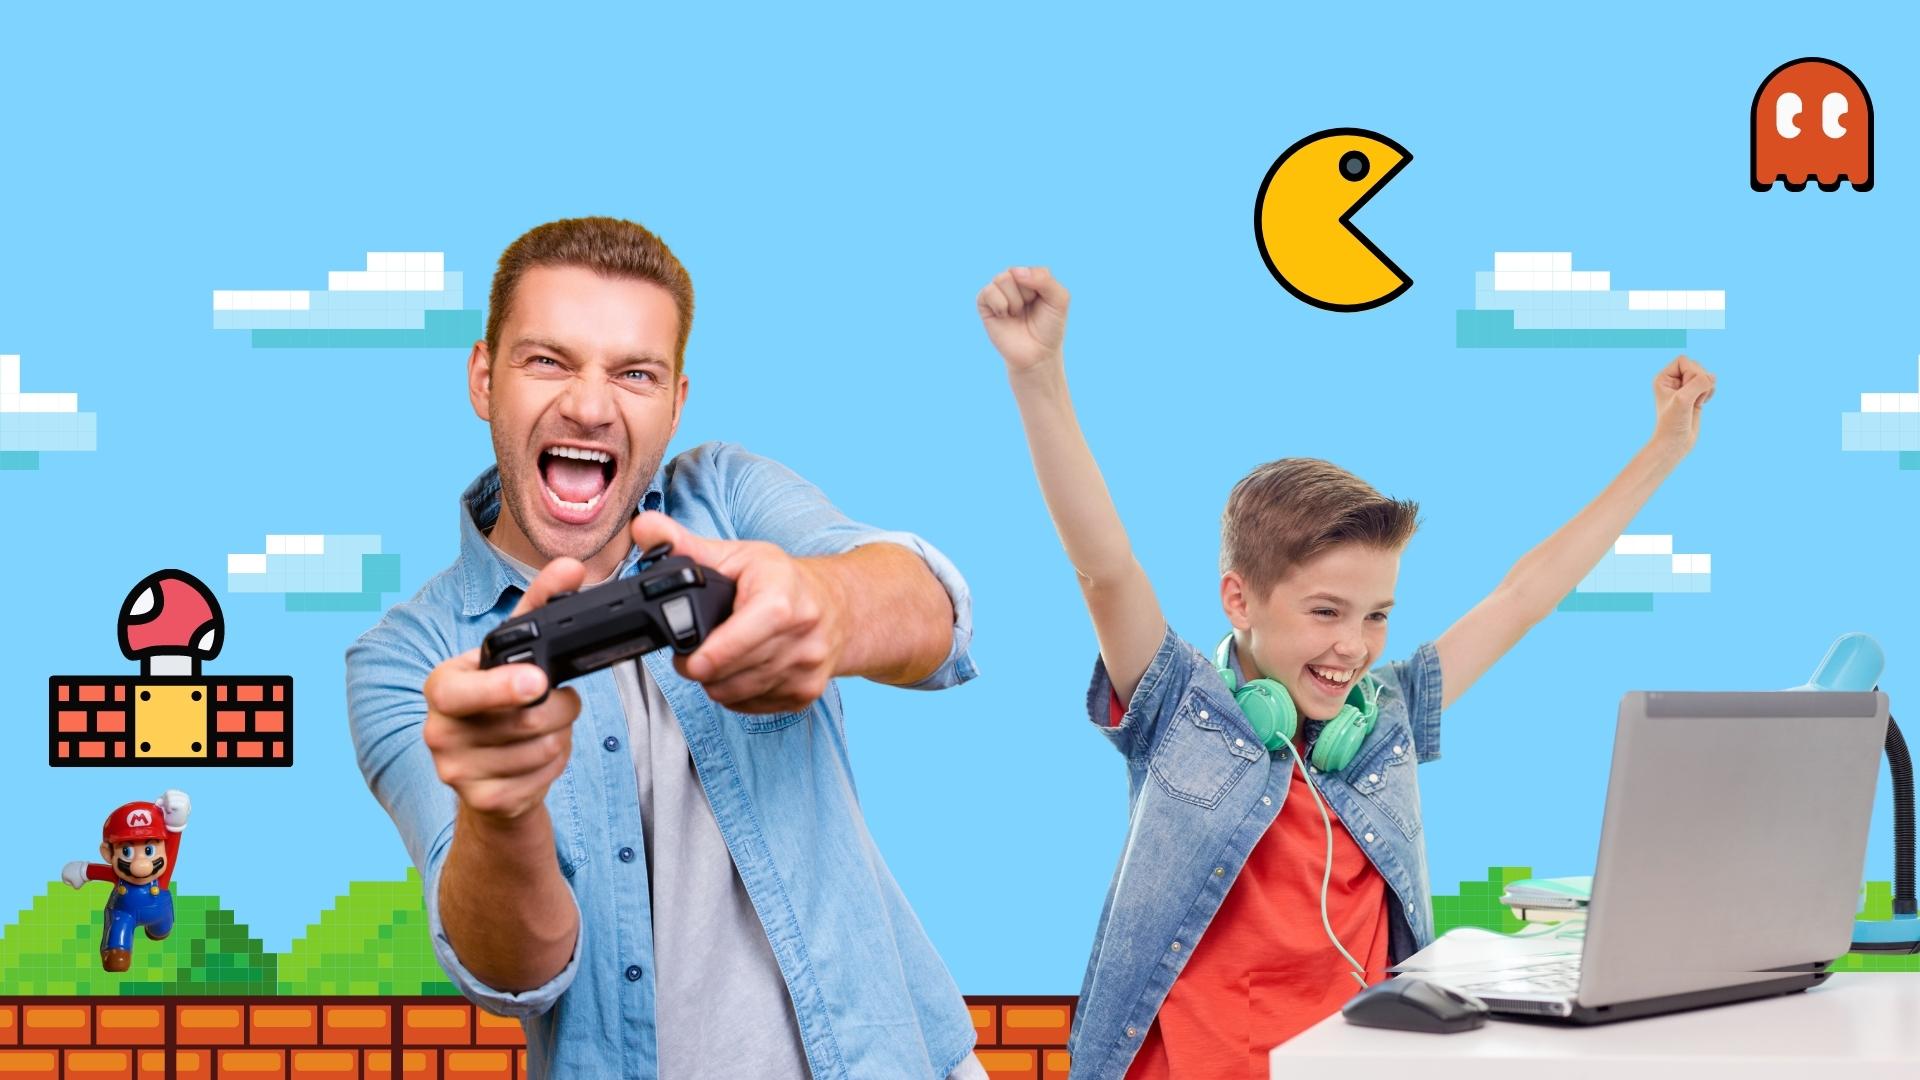 Nostalgia gamer